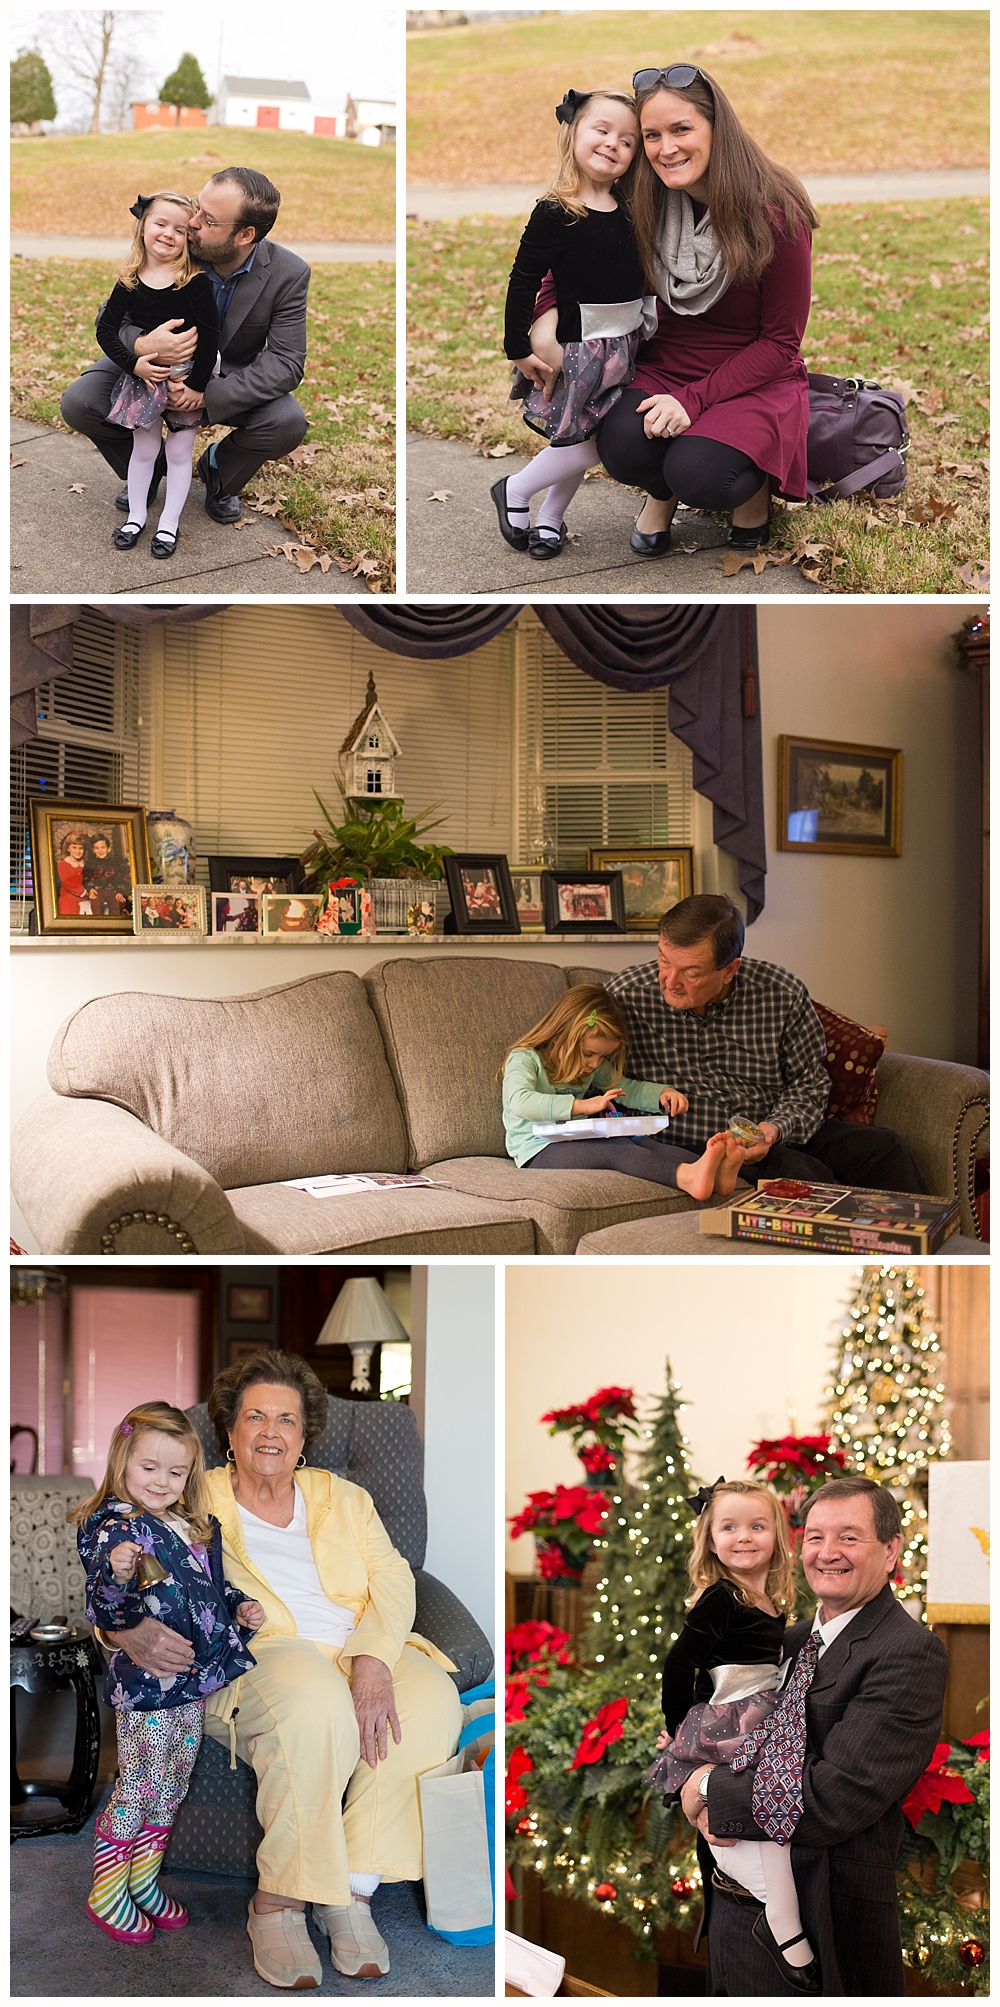 family snapshots at Christmastime